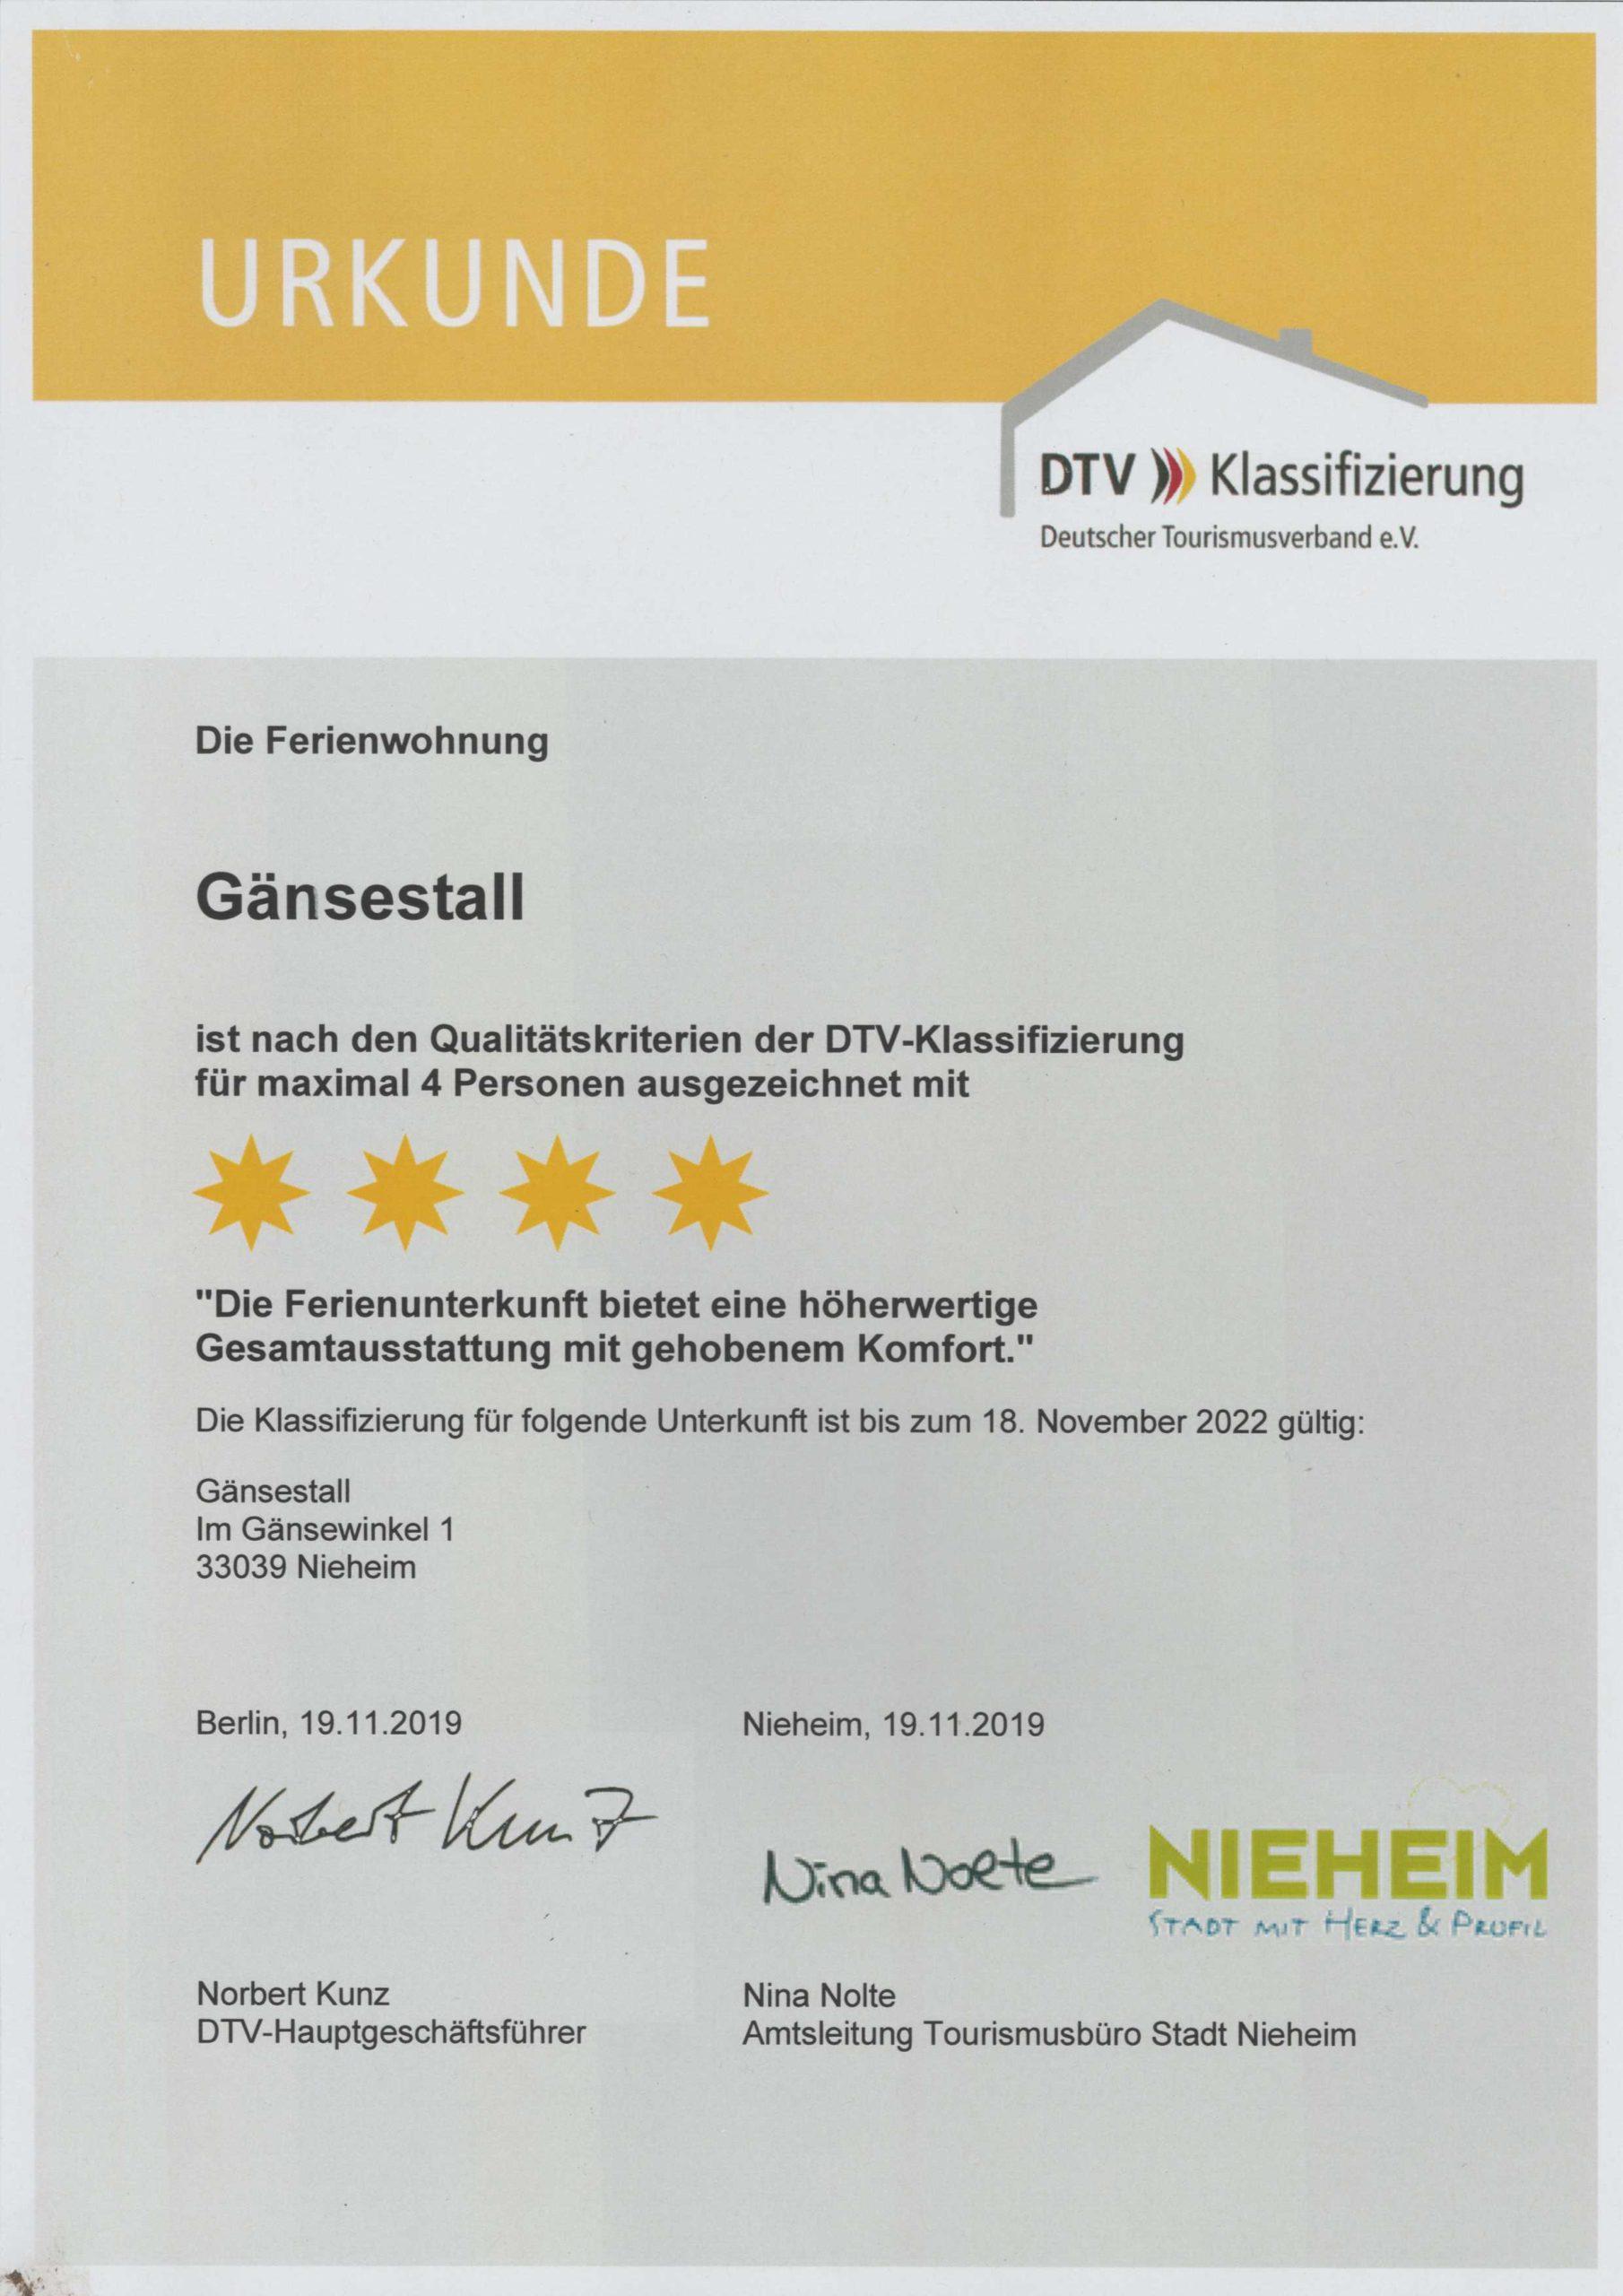 Zertifizierung FeWo, Urkunde Nov. 2019-2022